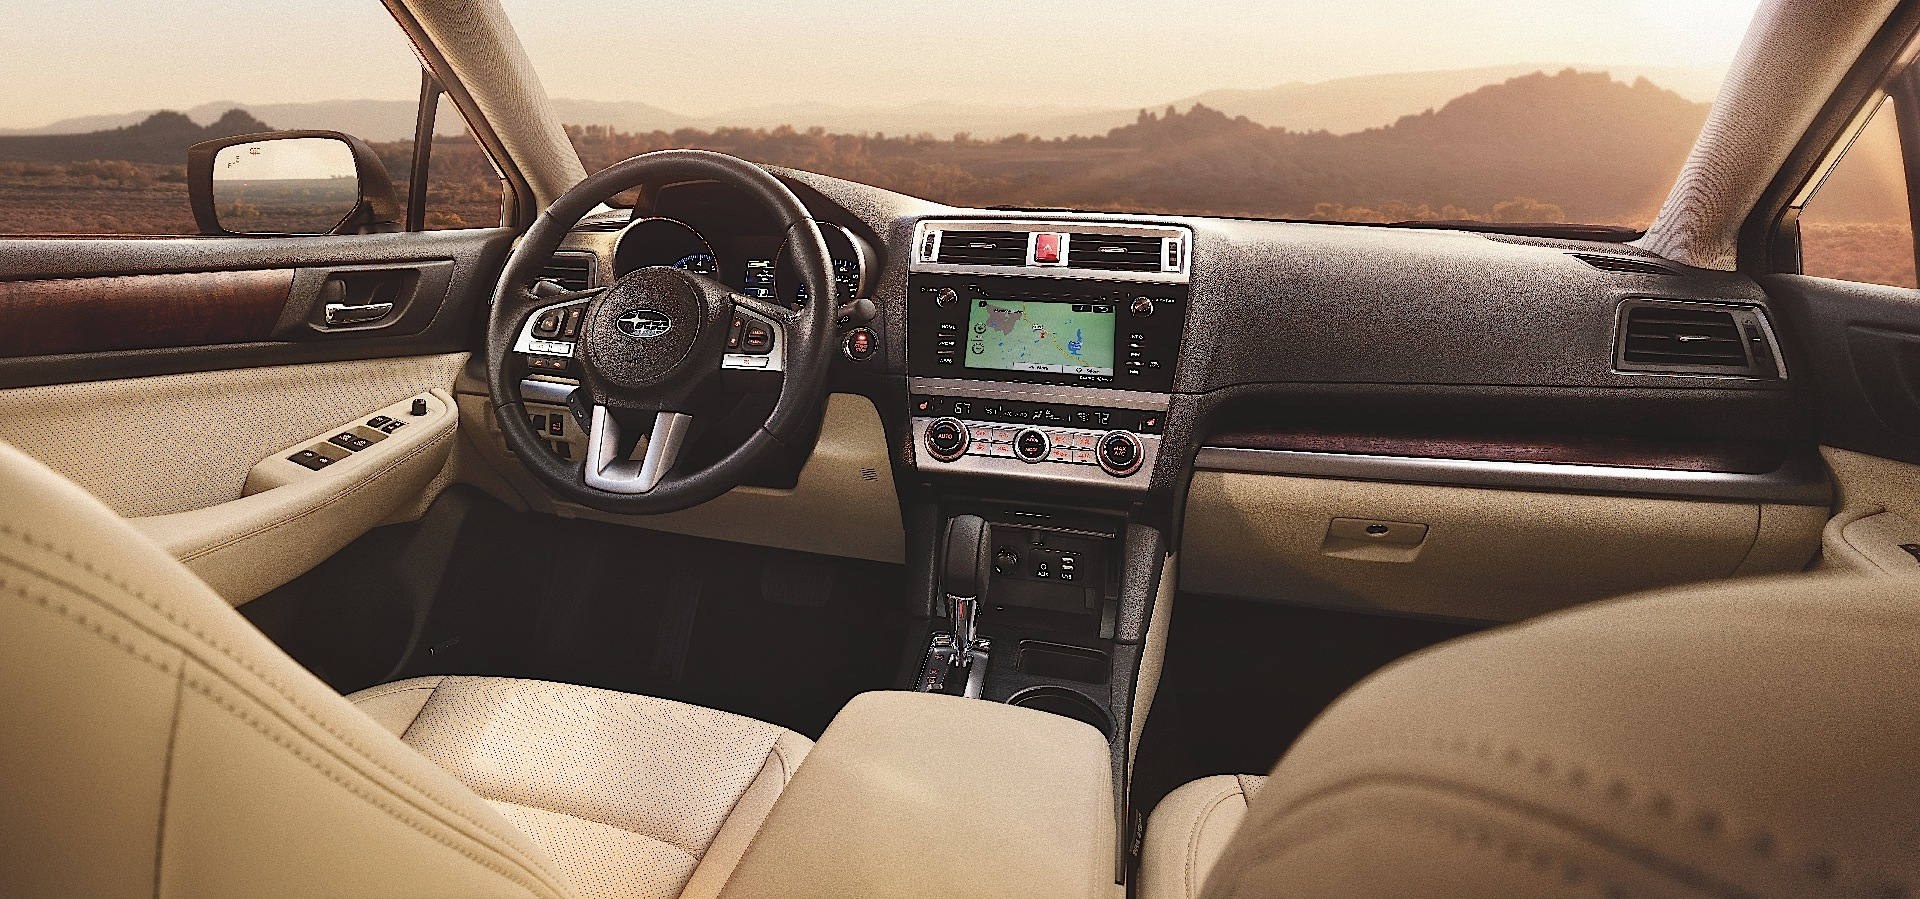 Subaru Outback Specs 2014 2015 2016 2017 2018 Autoevolution